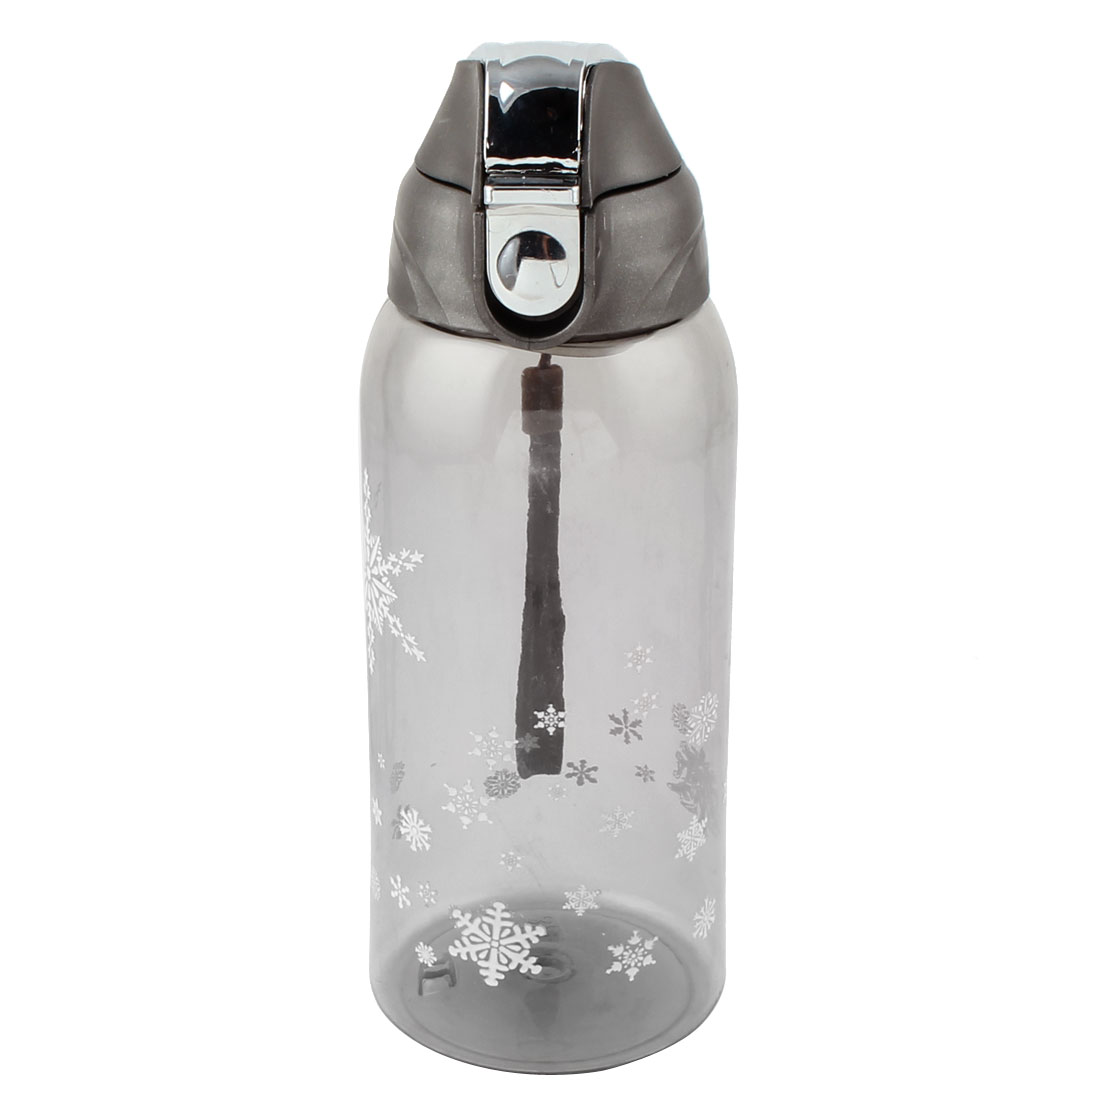 Outdoor Travel Plastic Fruit Juice Tea Cup Water Bottle Running Sports Kettle Gray 800ml